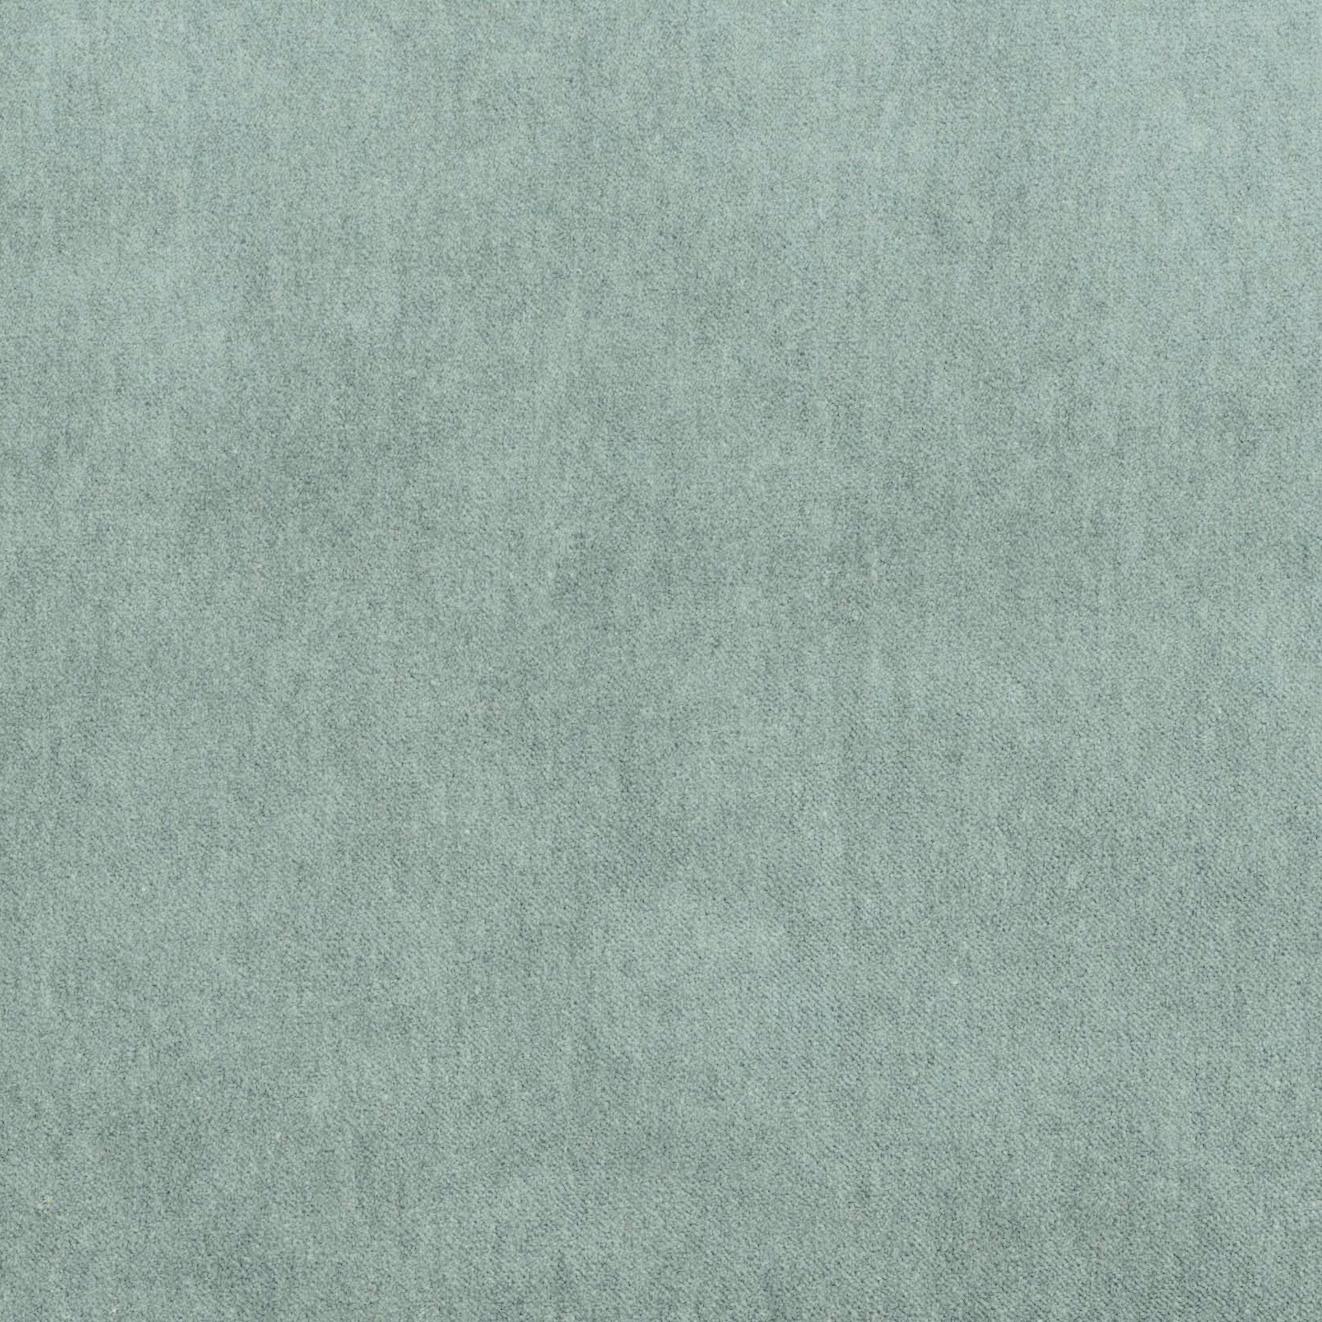 4 Malibu velvet turquoise